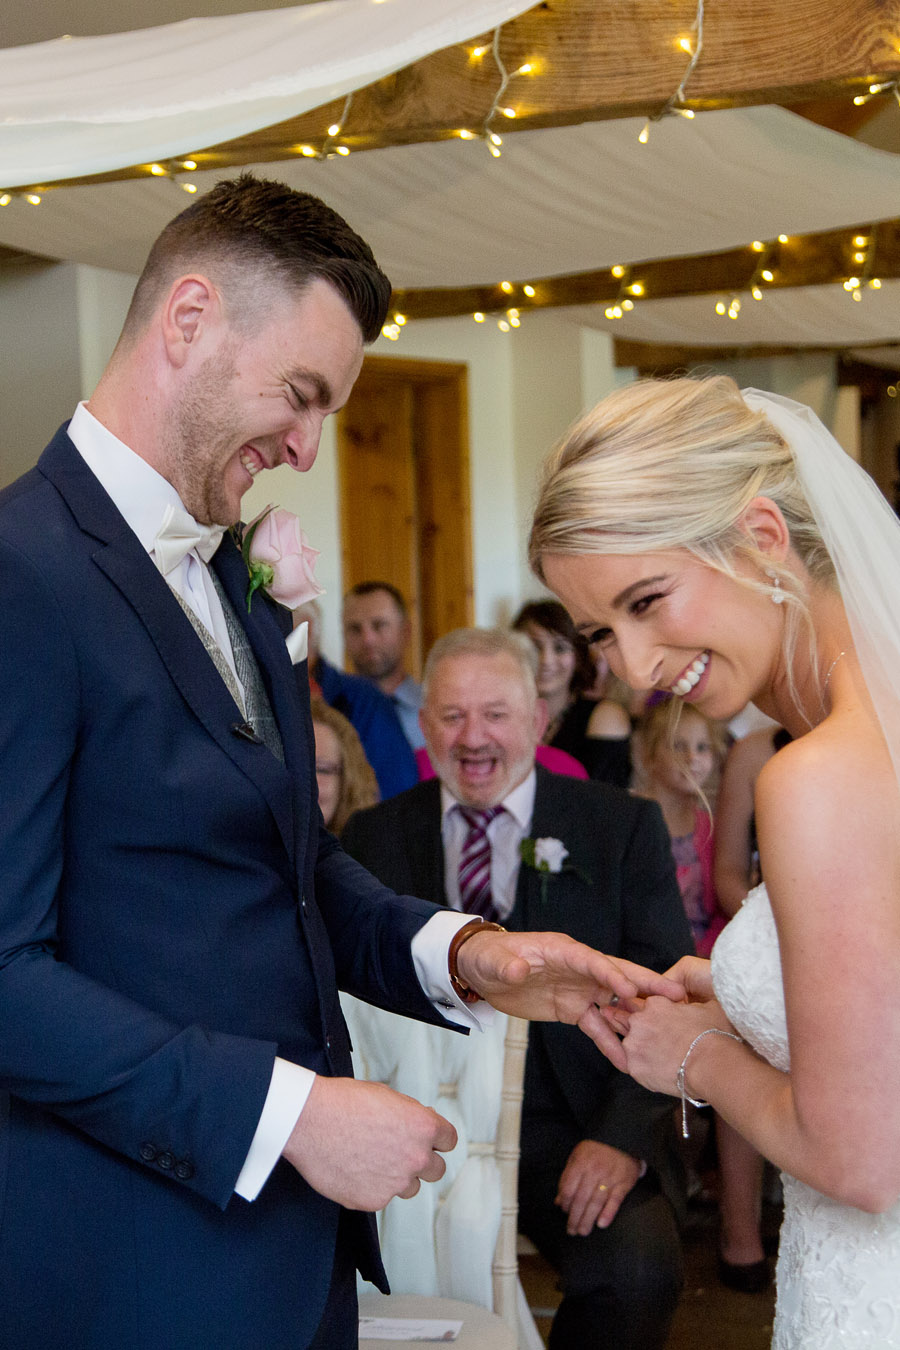 Quantock Lakes wedding styling ideas real wedding photographer Martin Dabek on the English Wedding Blog (6)